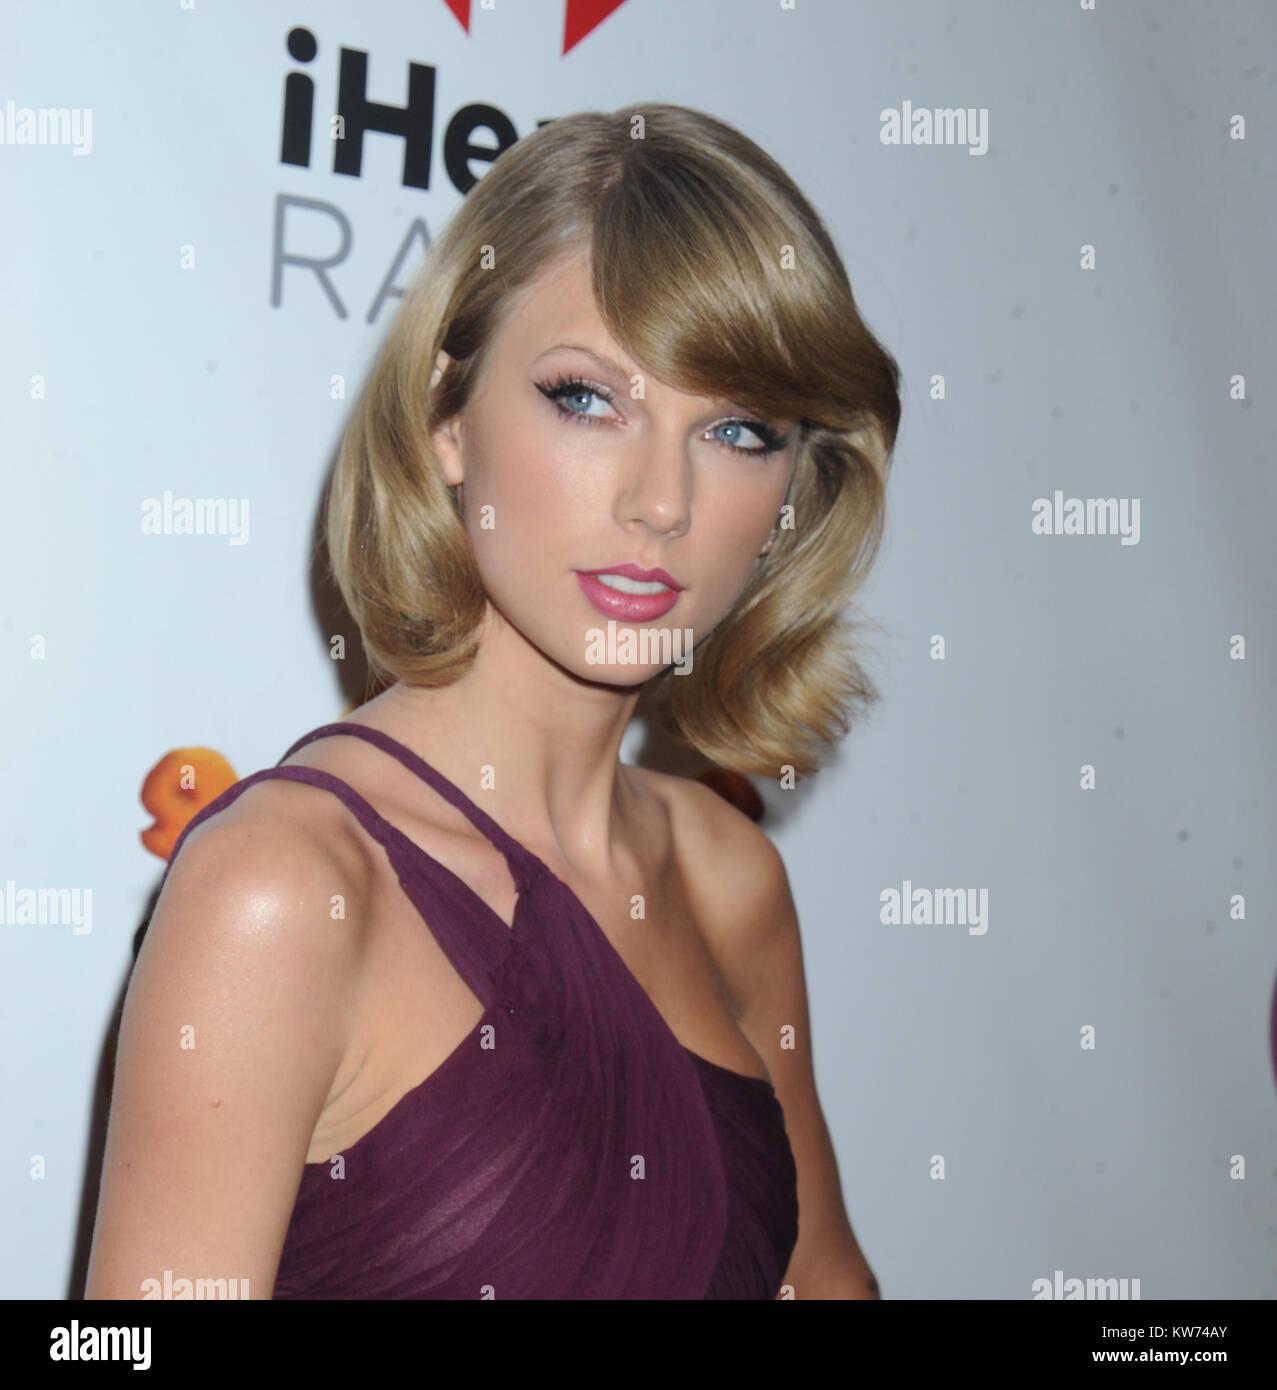 12. Taylor Swift